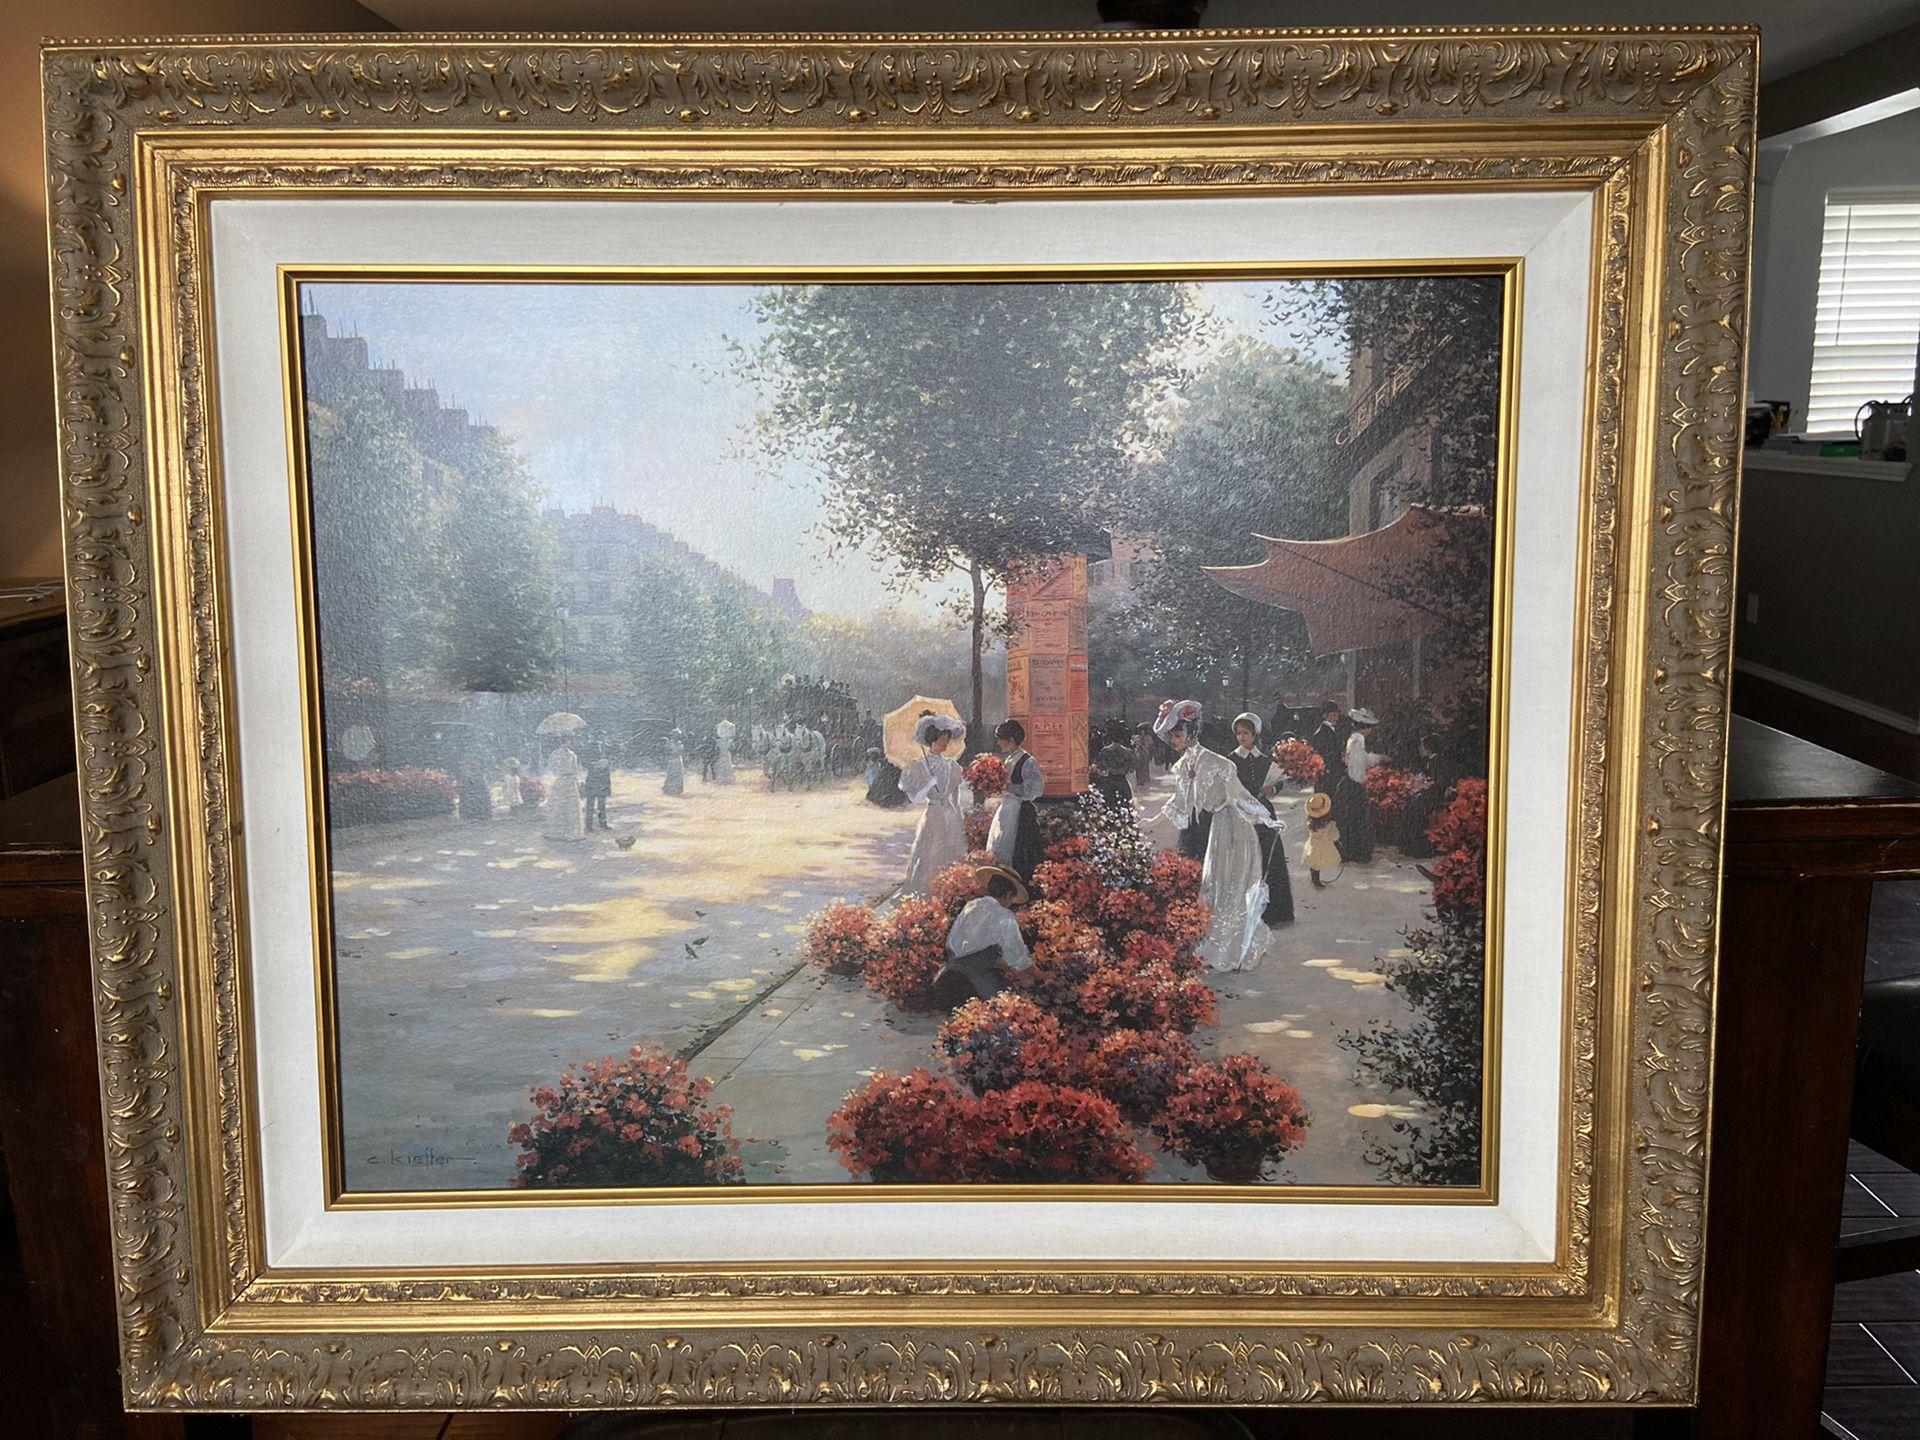 Christa Kiefer oil painting on canvas